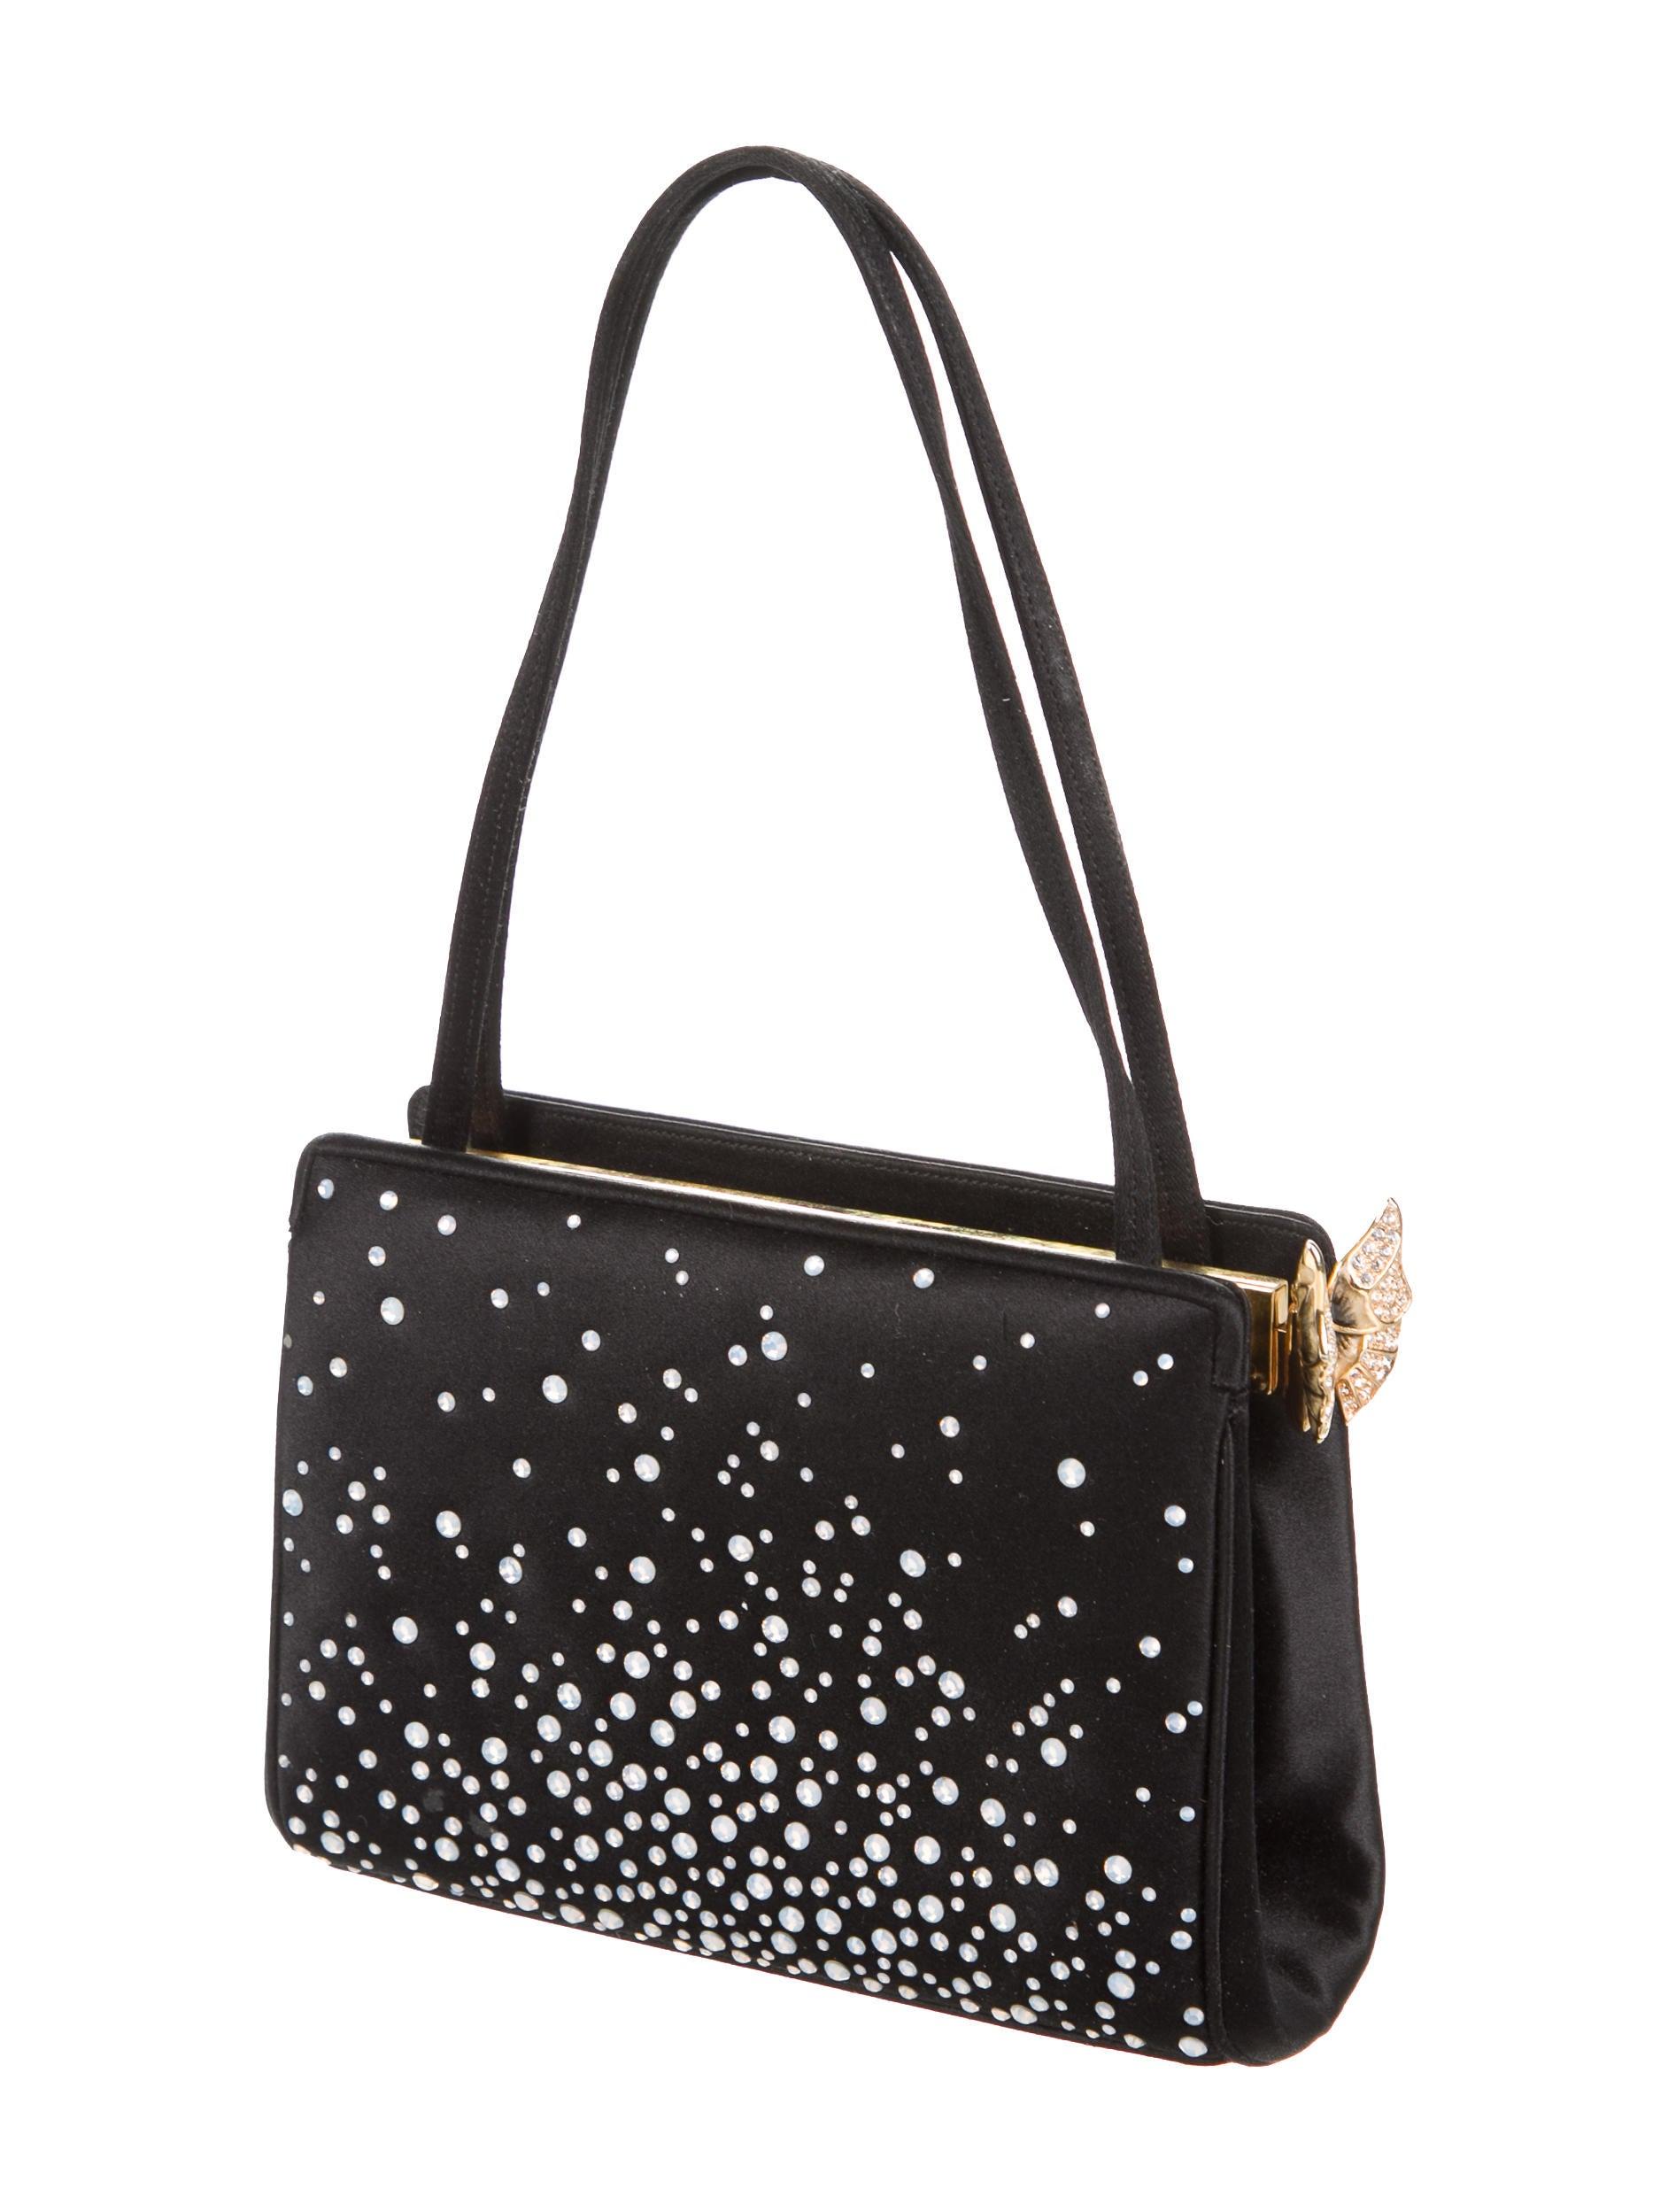 Judith Leiber Satin Embellished Bag - Handbags